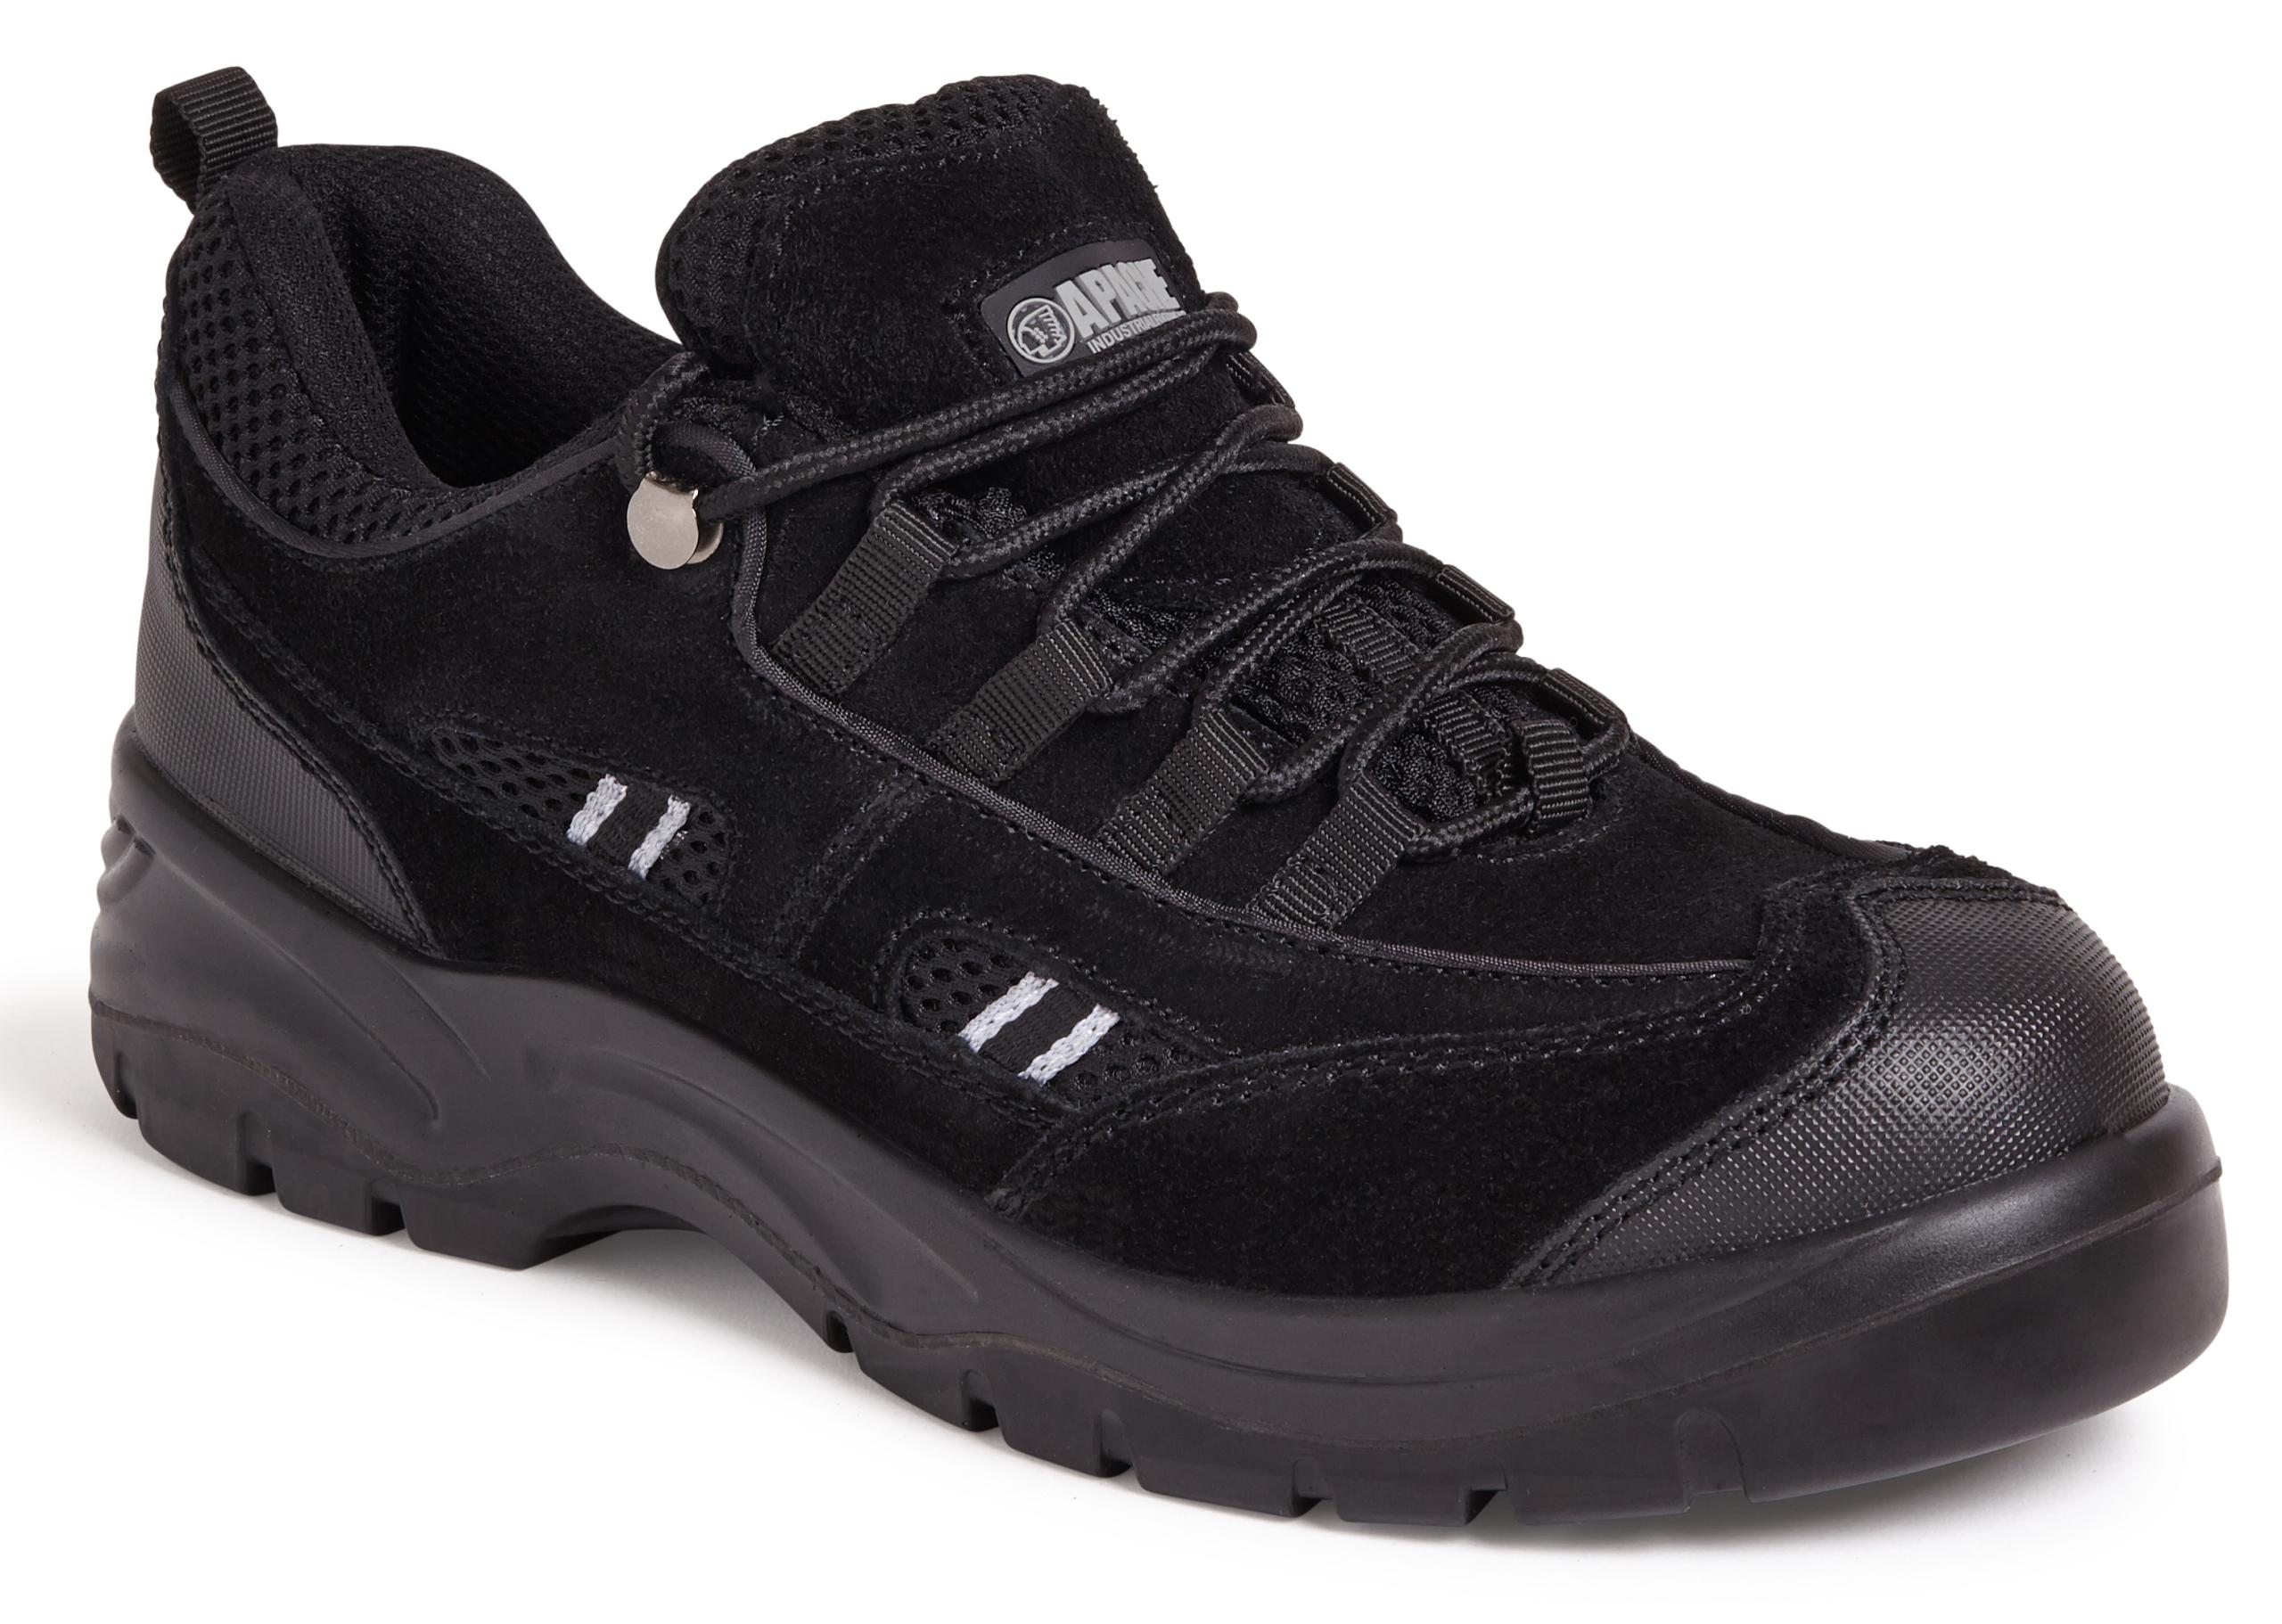 e7eaefac83d Apache Safety Footwear